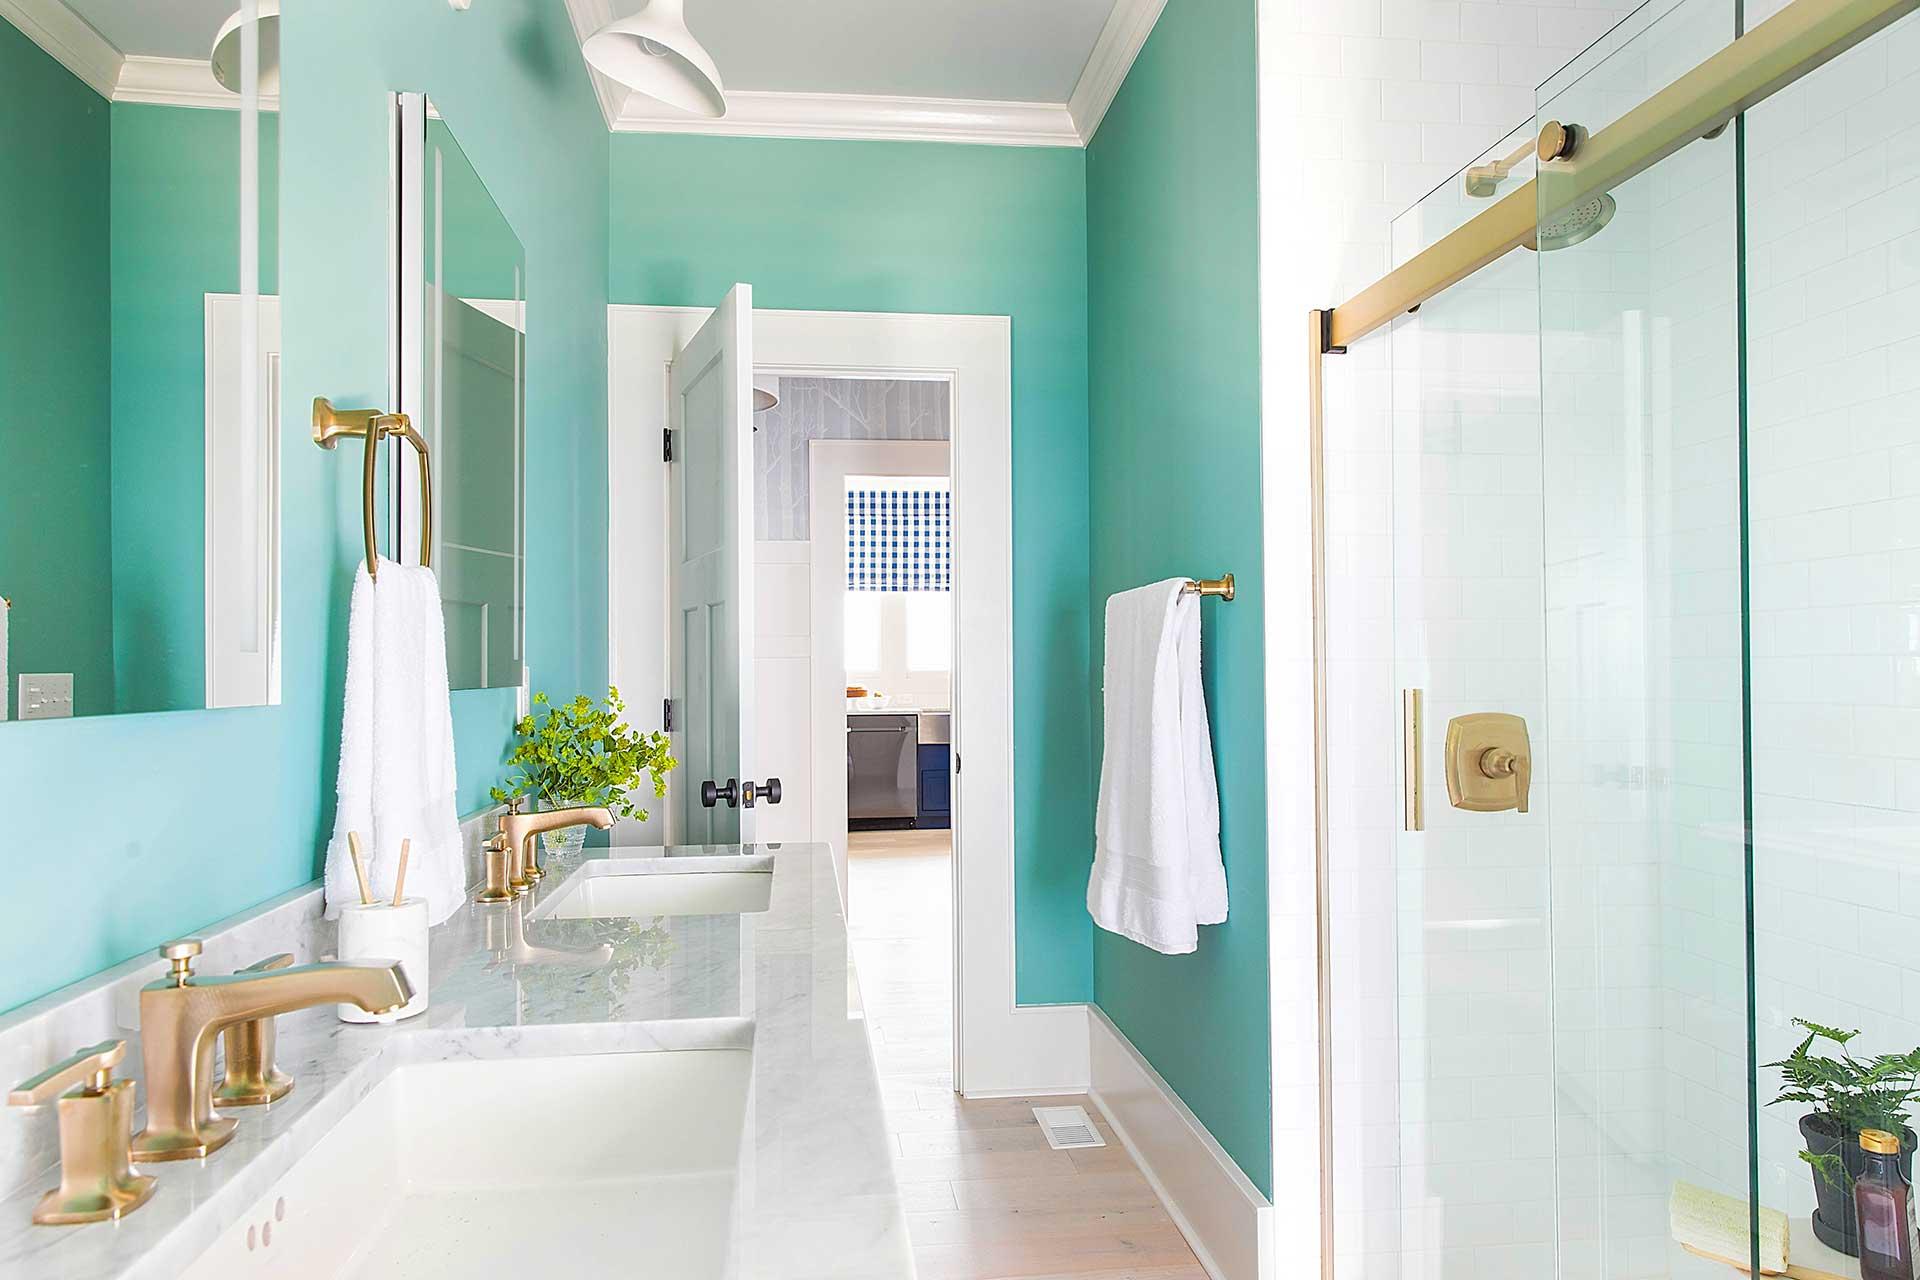 https://opendoorarchitecture.com/wp-content/uploads/2020/07/15_HGTV-Urban-Oasis-2017-Guest-Bathroom.jpg